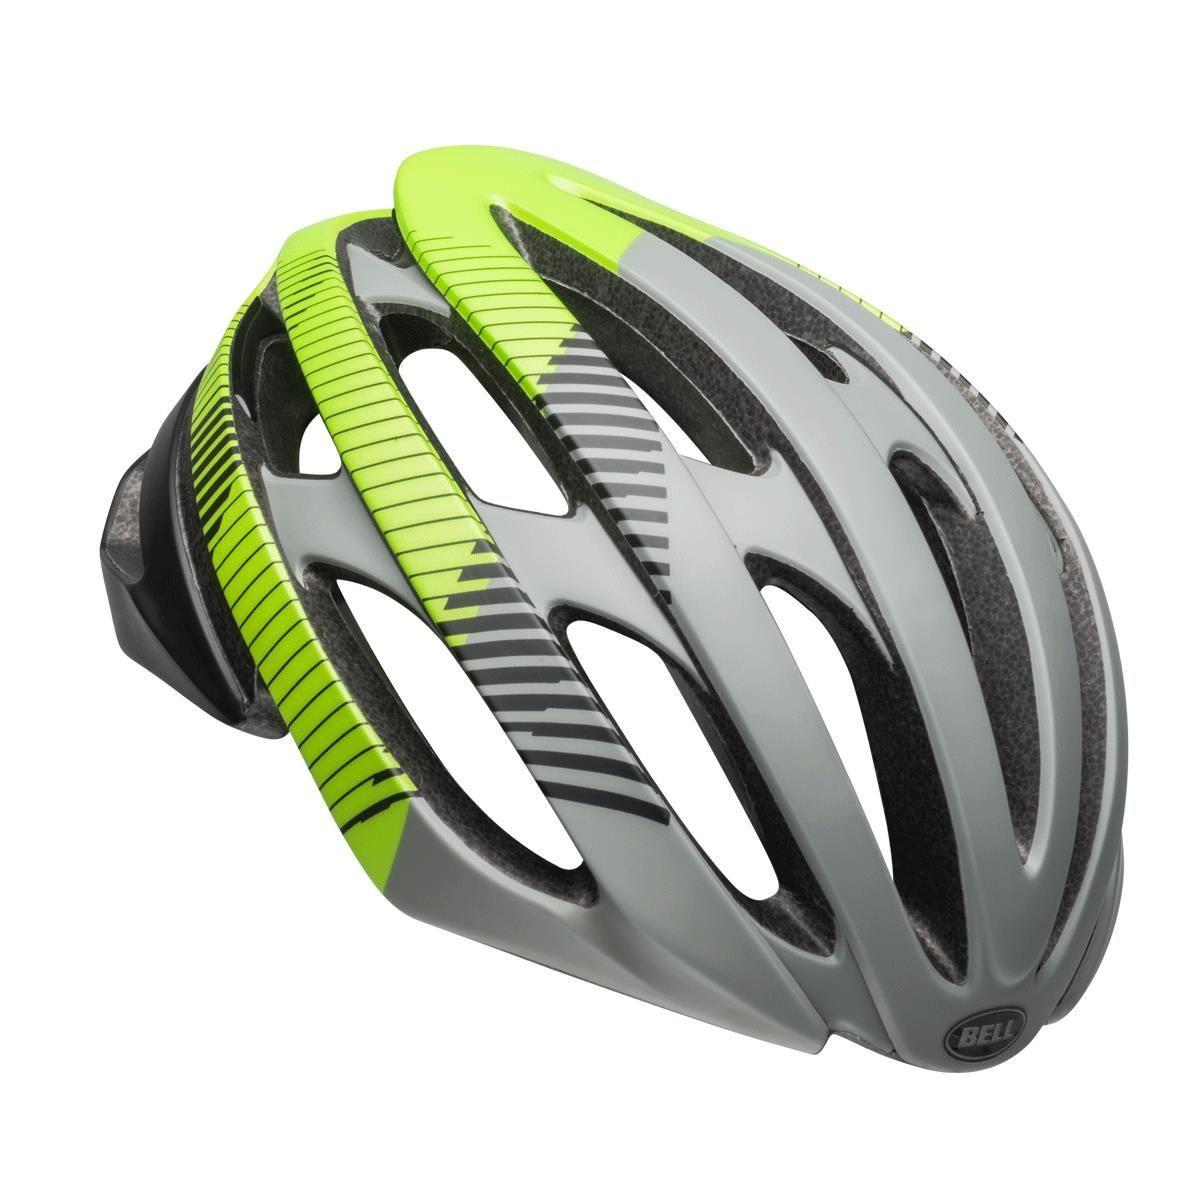 Bell Stratus Road Helmet 2019: Bluster Matte Grey/Black/Green M 55-59Cm